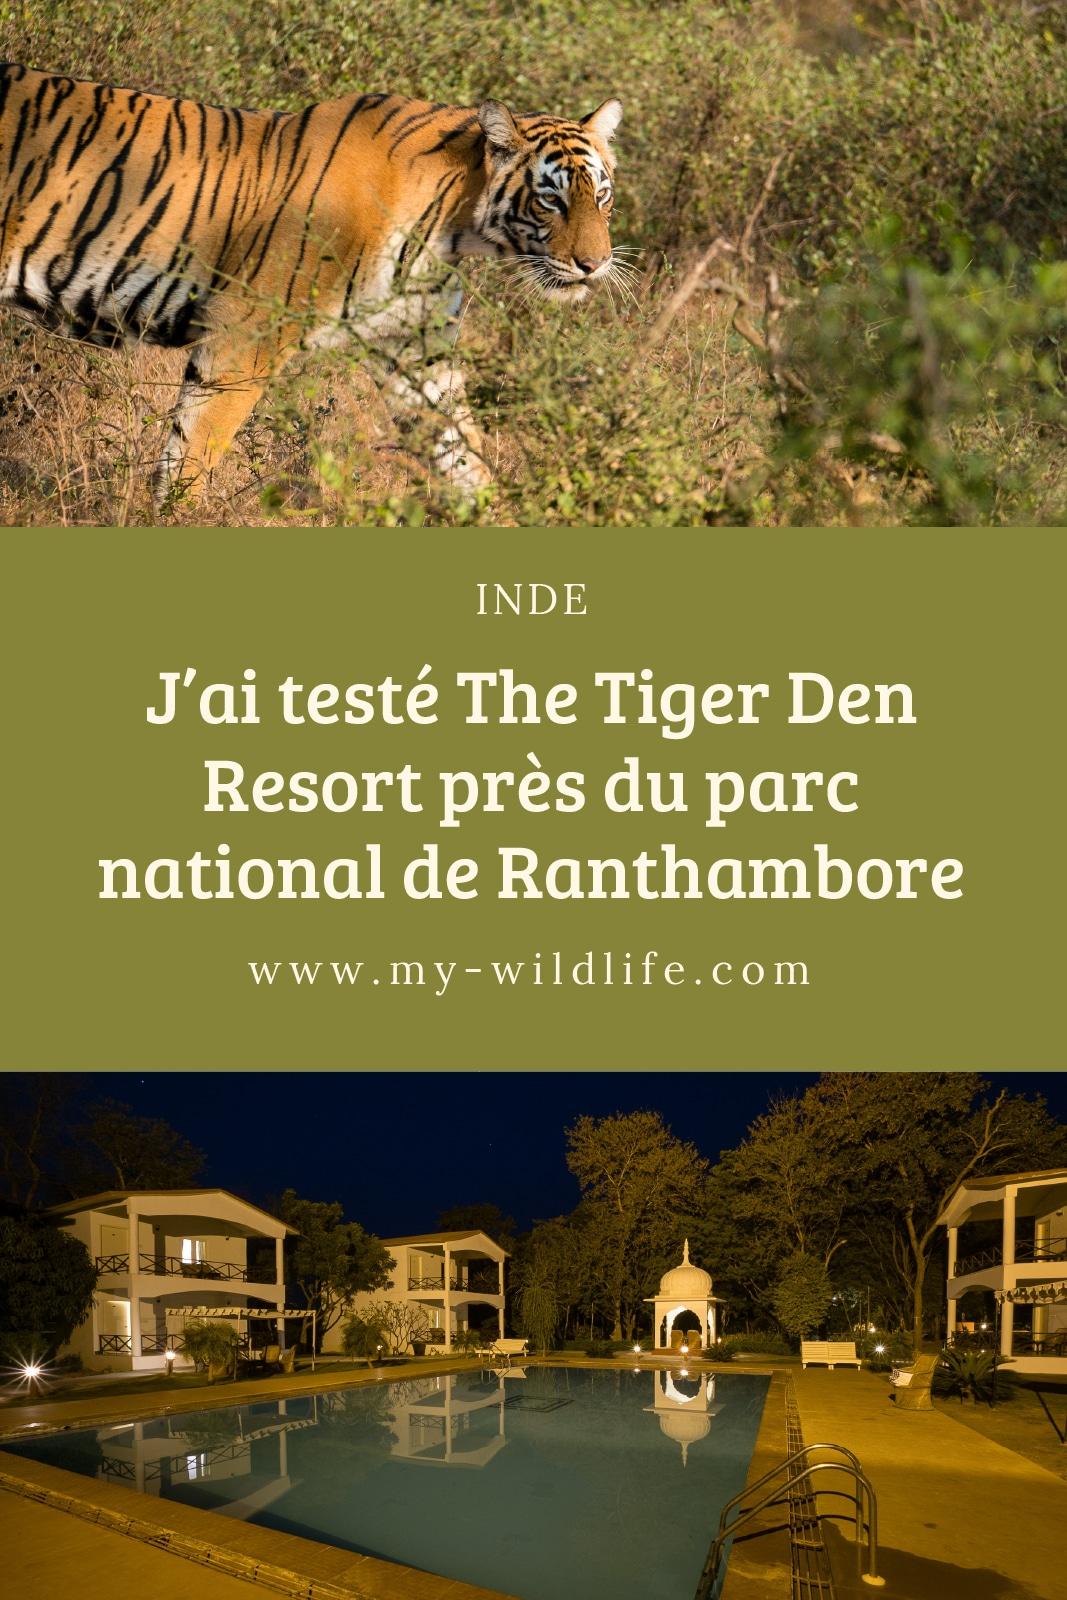 tigerdenresort-01